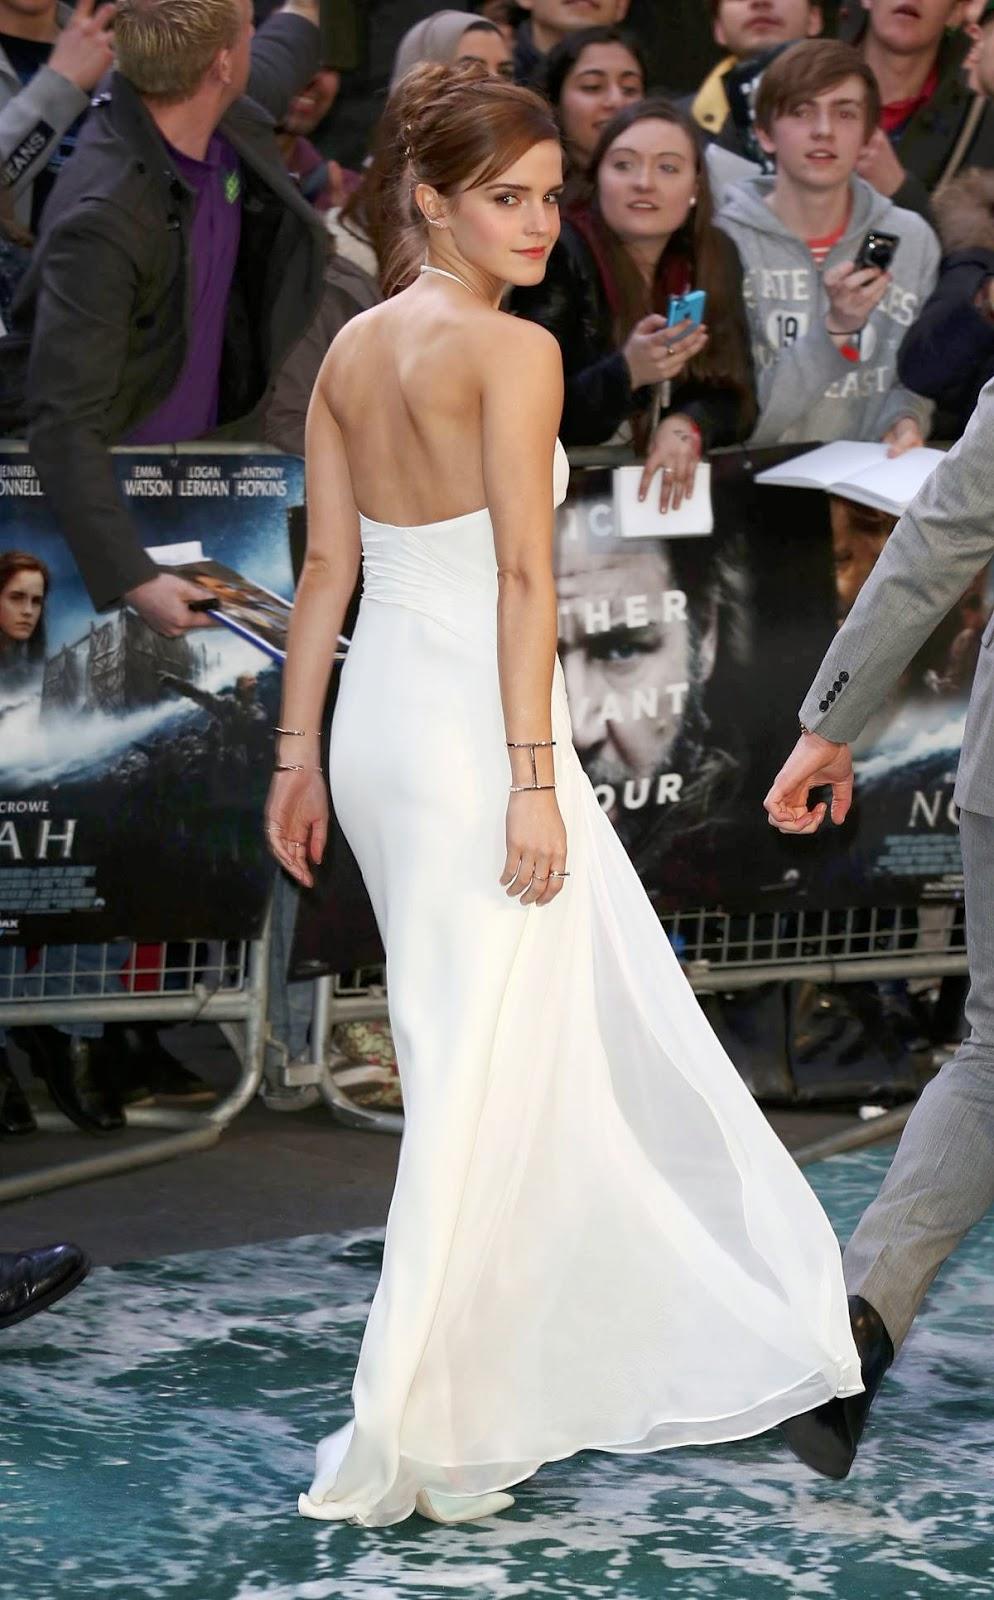 Hot Photos of Emma Watson